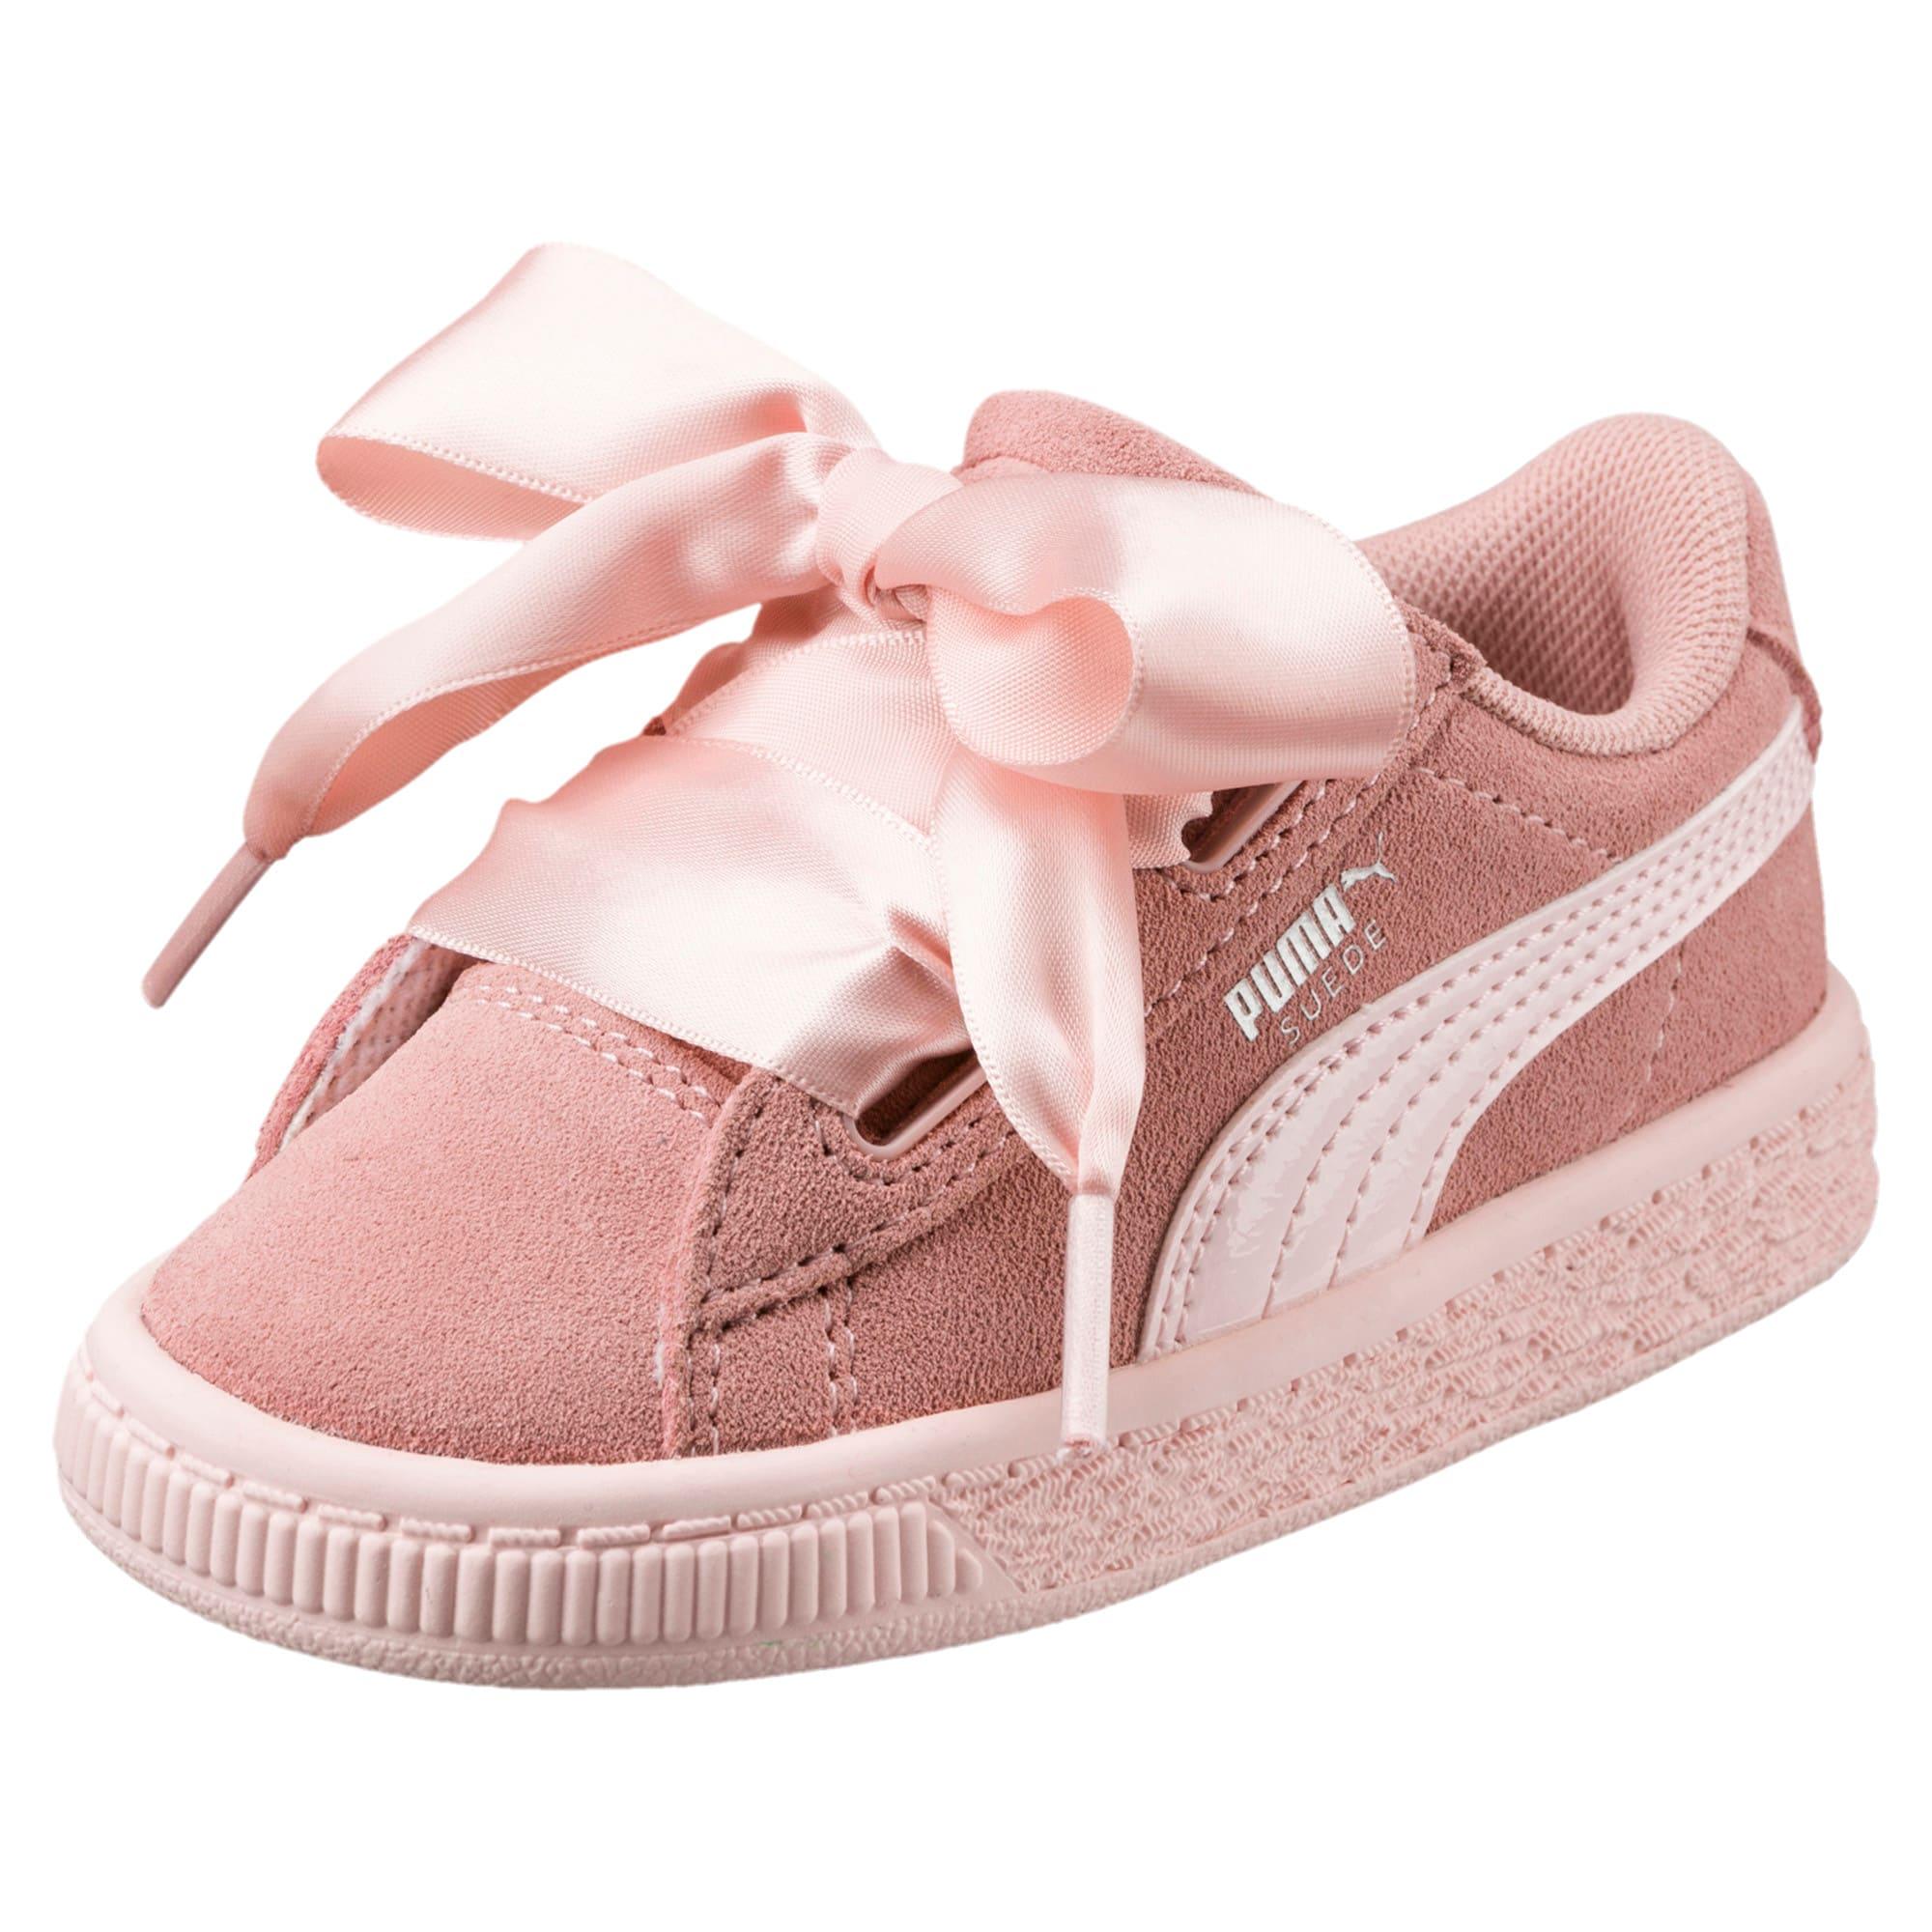 Suede Heart Jewel Baby Trainers